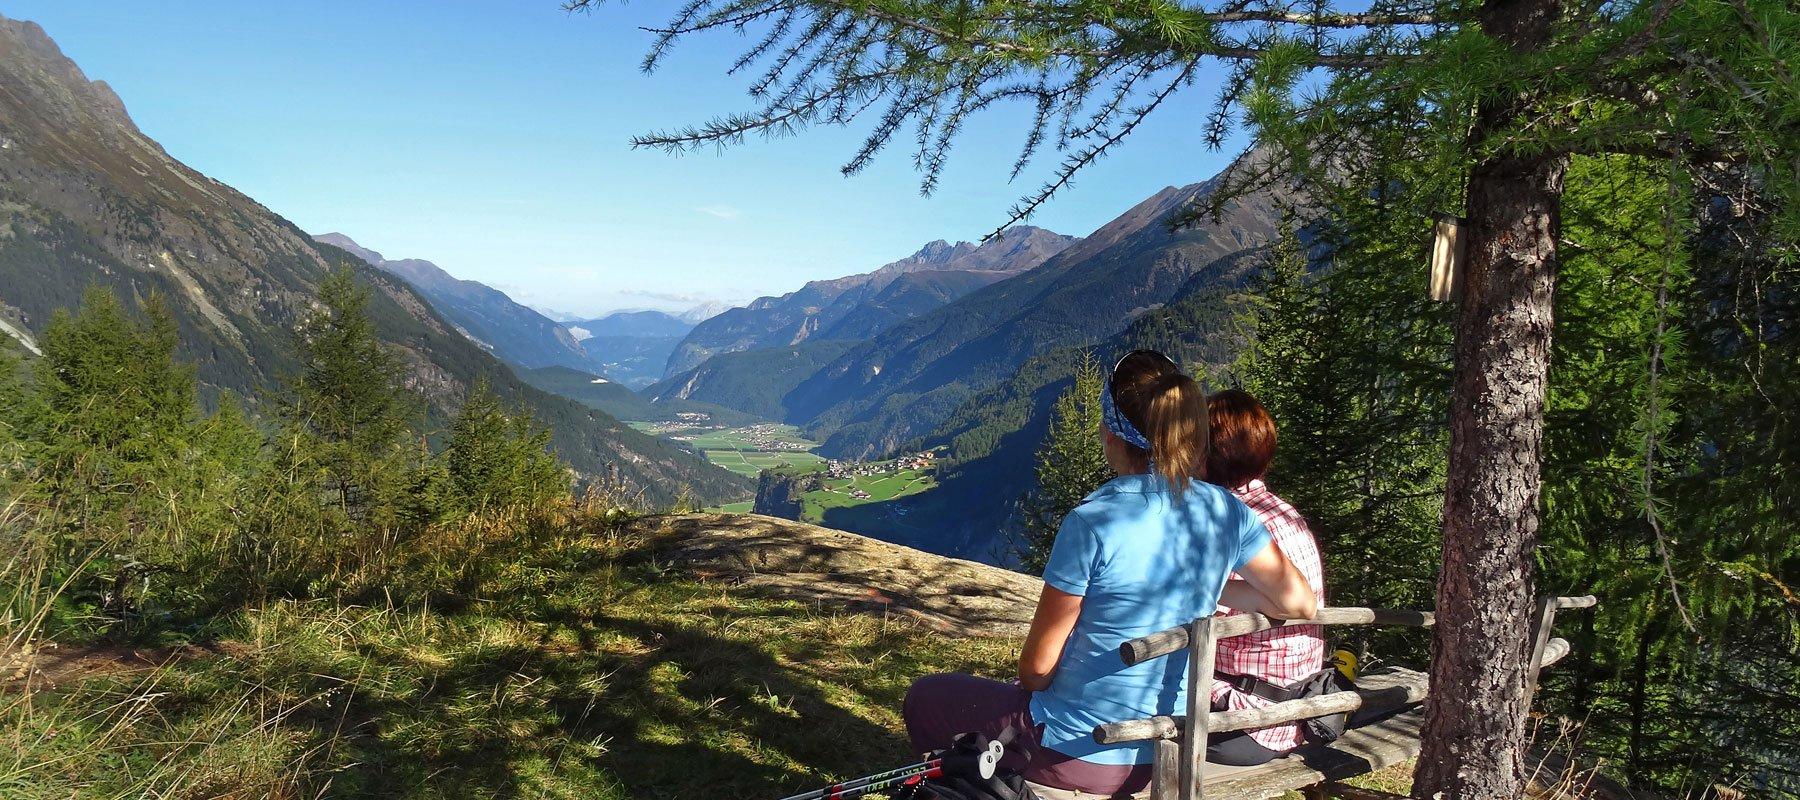 Sommerurlaub in Längenfeld